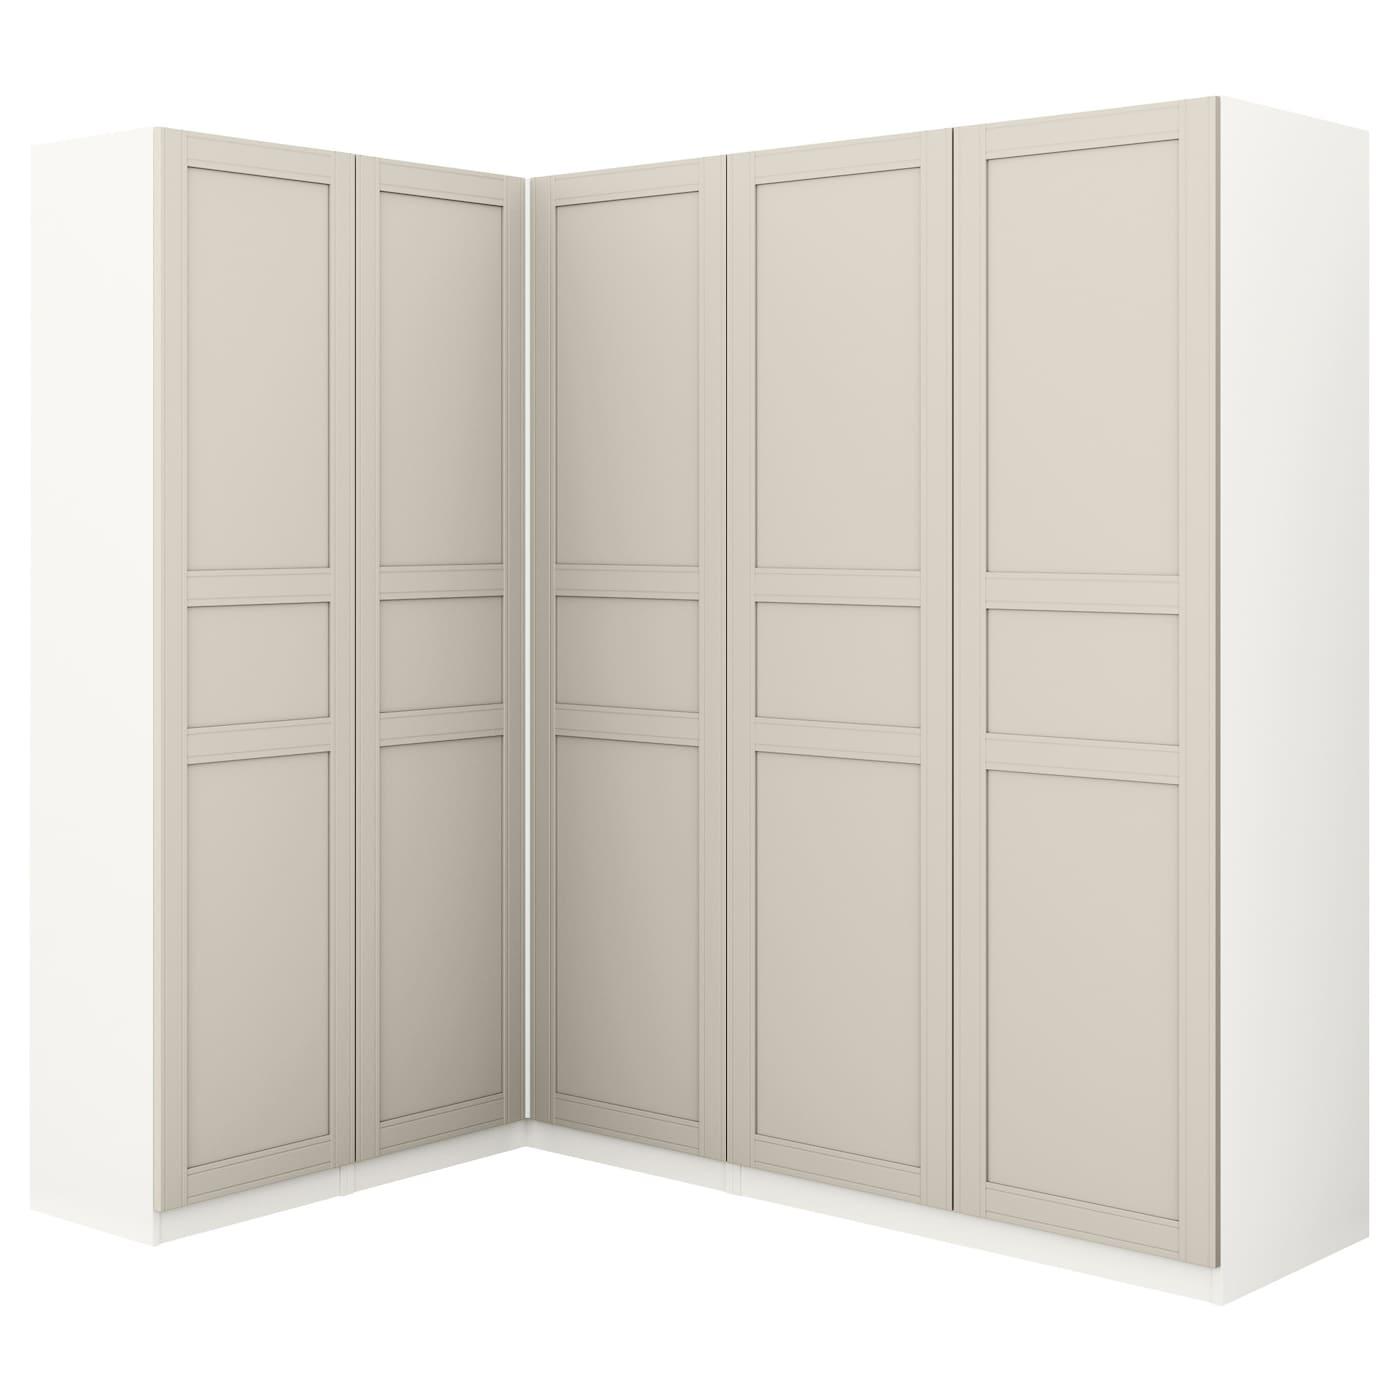 pax corner wardrobe white flisberget light beige 160 188 x 201 cm ikea. Black Bedroom Furniture Sets. Home Design Ideas